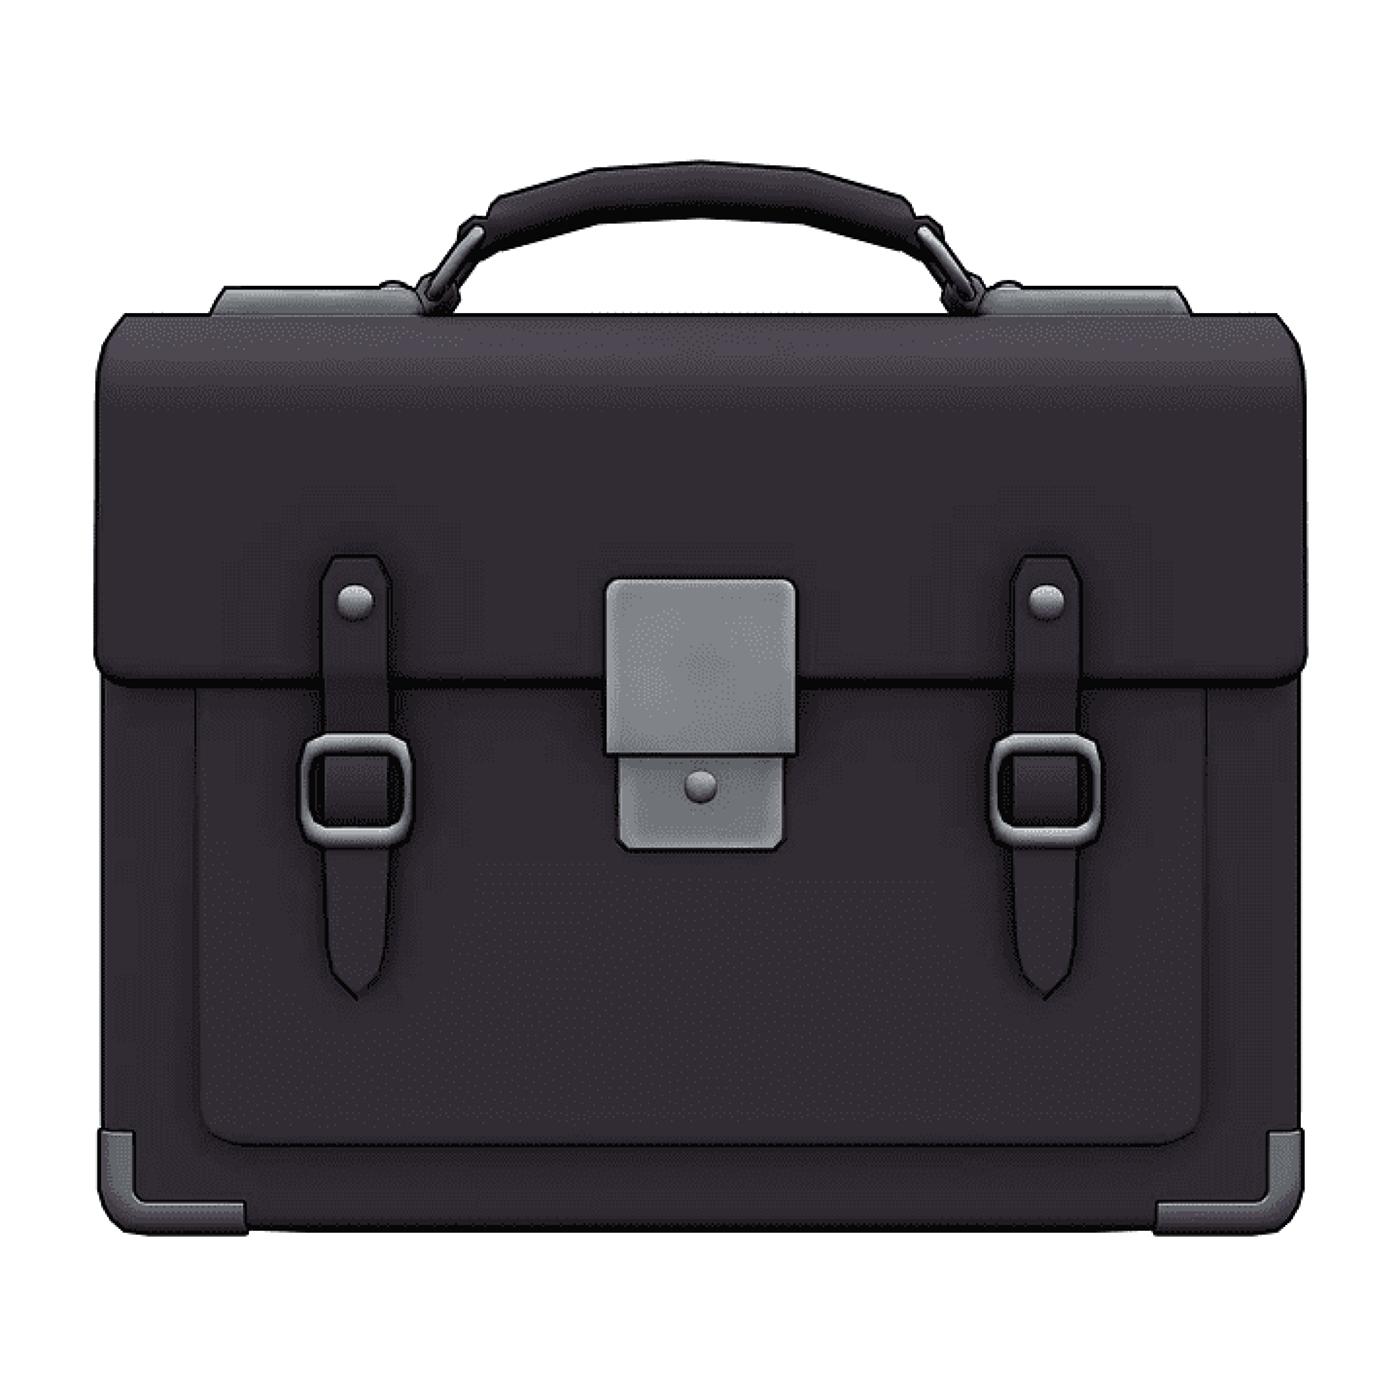 205181befe インターンの鞄ってどうすればいい?リュックでも大丈夫? | InfrA(インフラ)